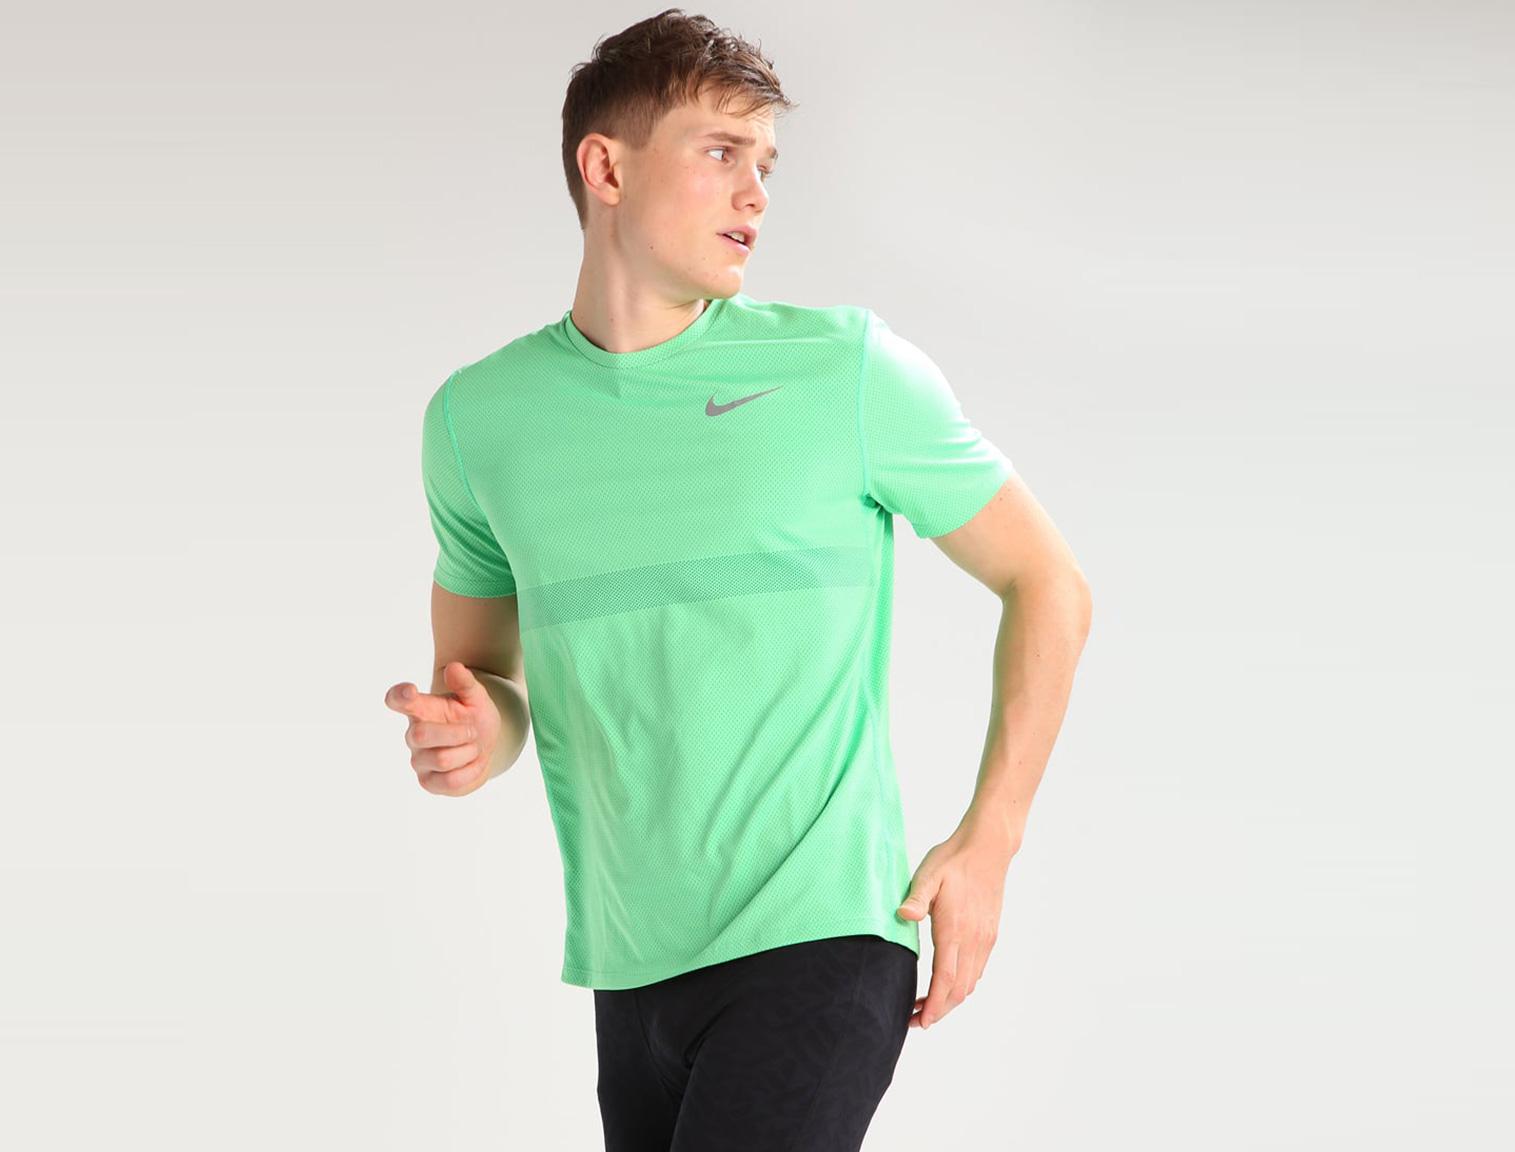 Hombre con camiseta running verde